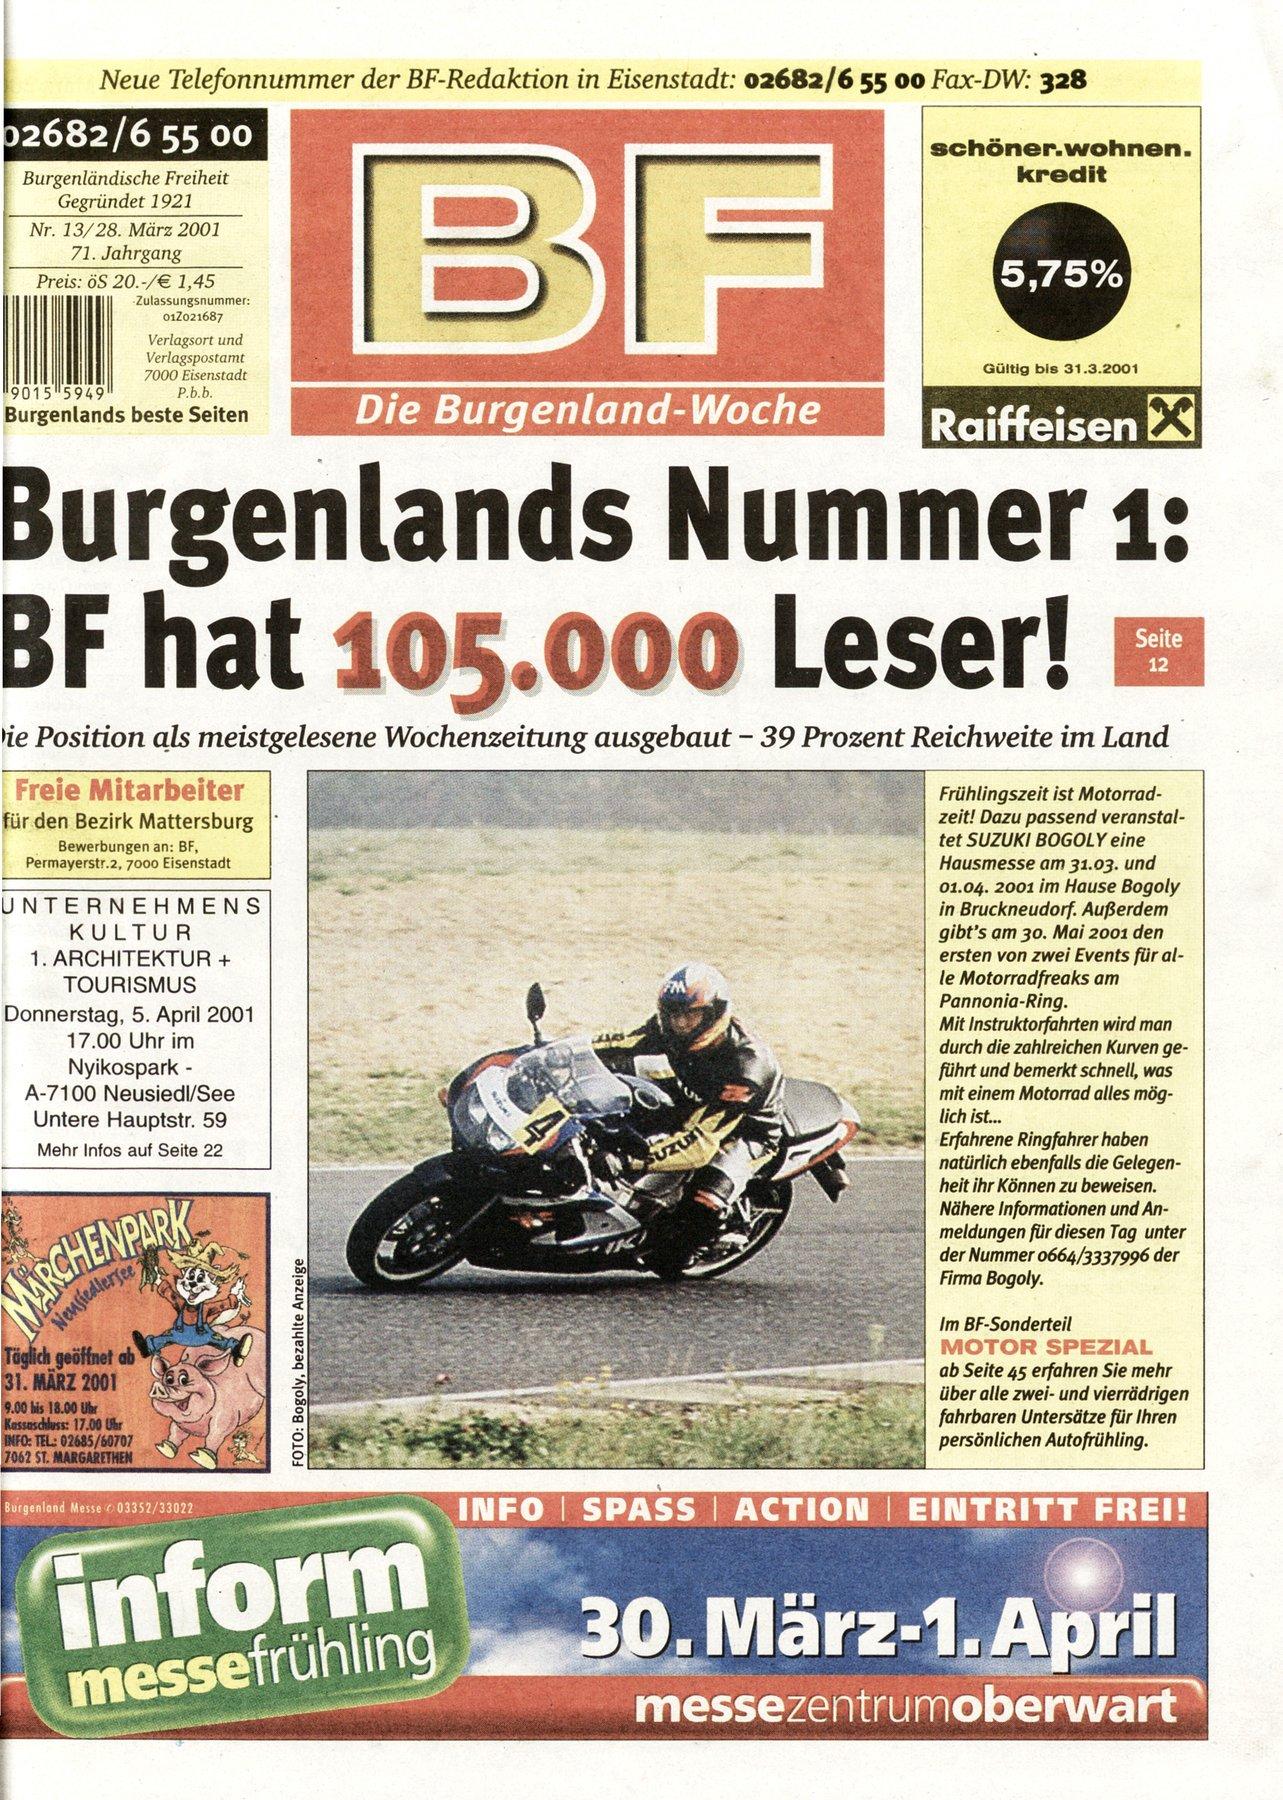 Die BF hat 105.000 Leser